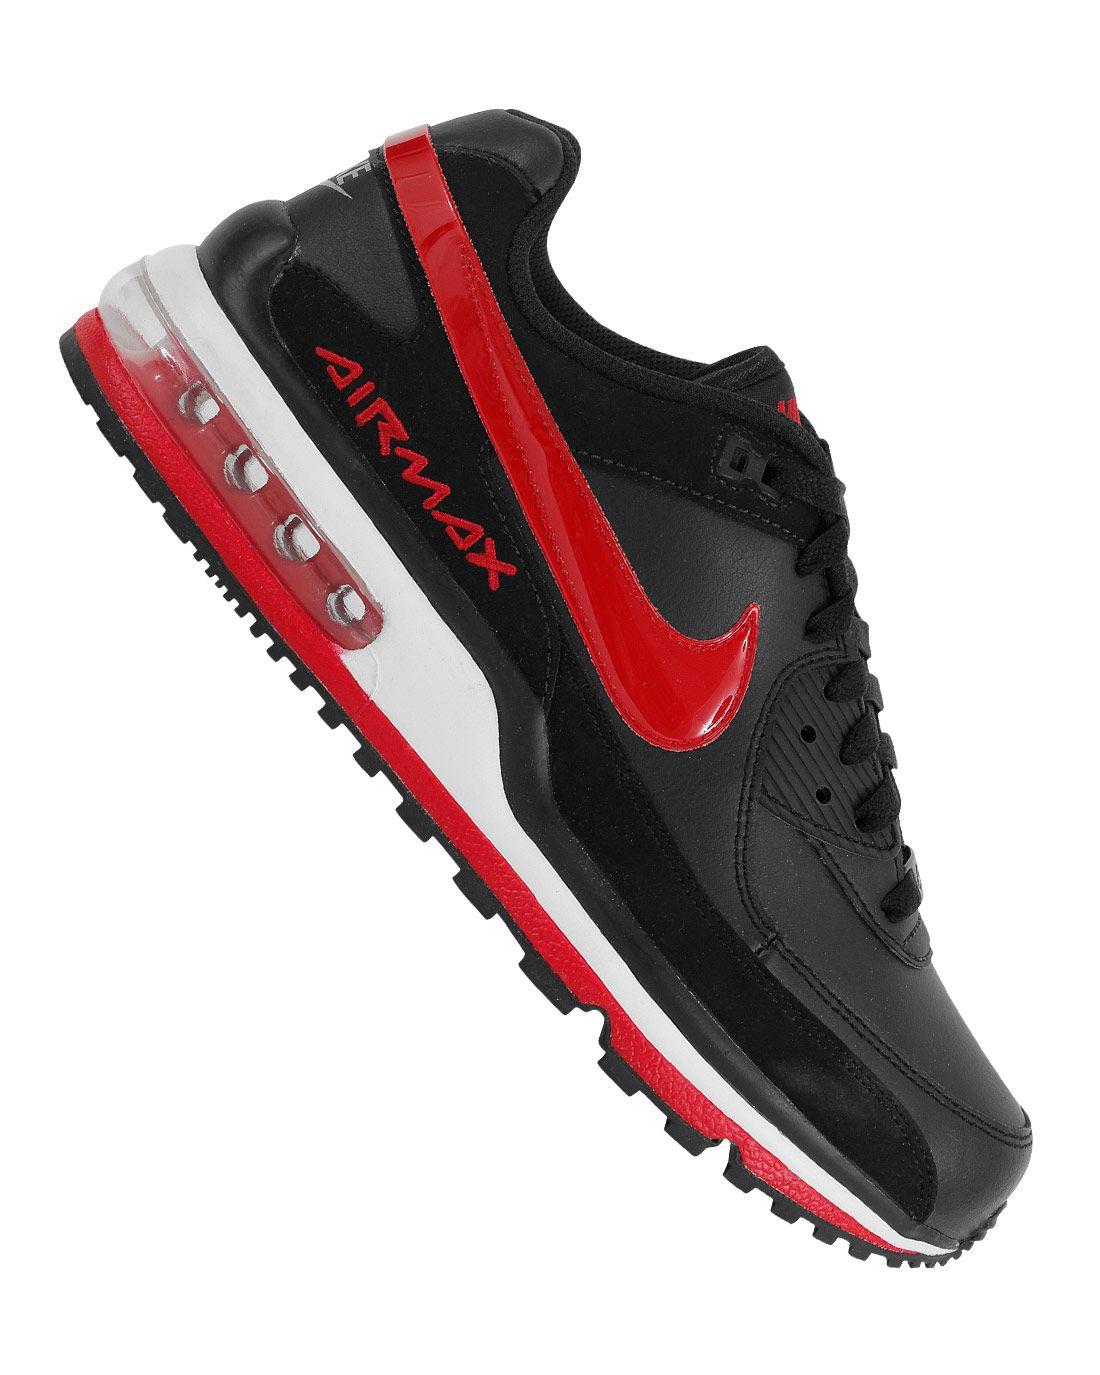 NIKE Air Max LTD II | Turnschuhe, Schuhe und Herrenschuhe